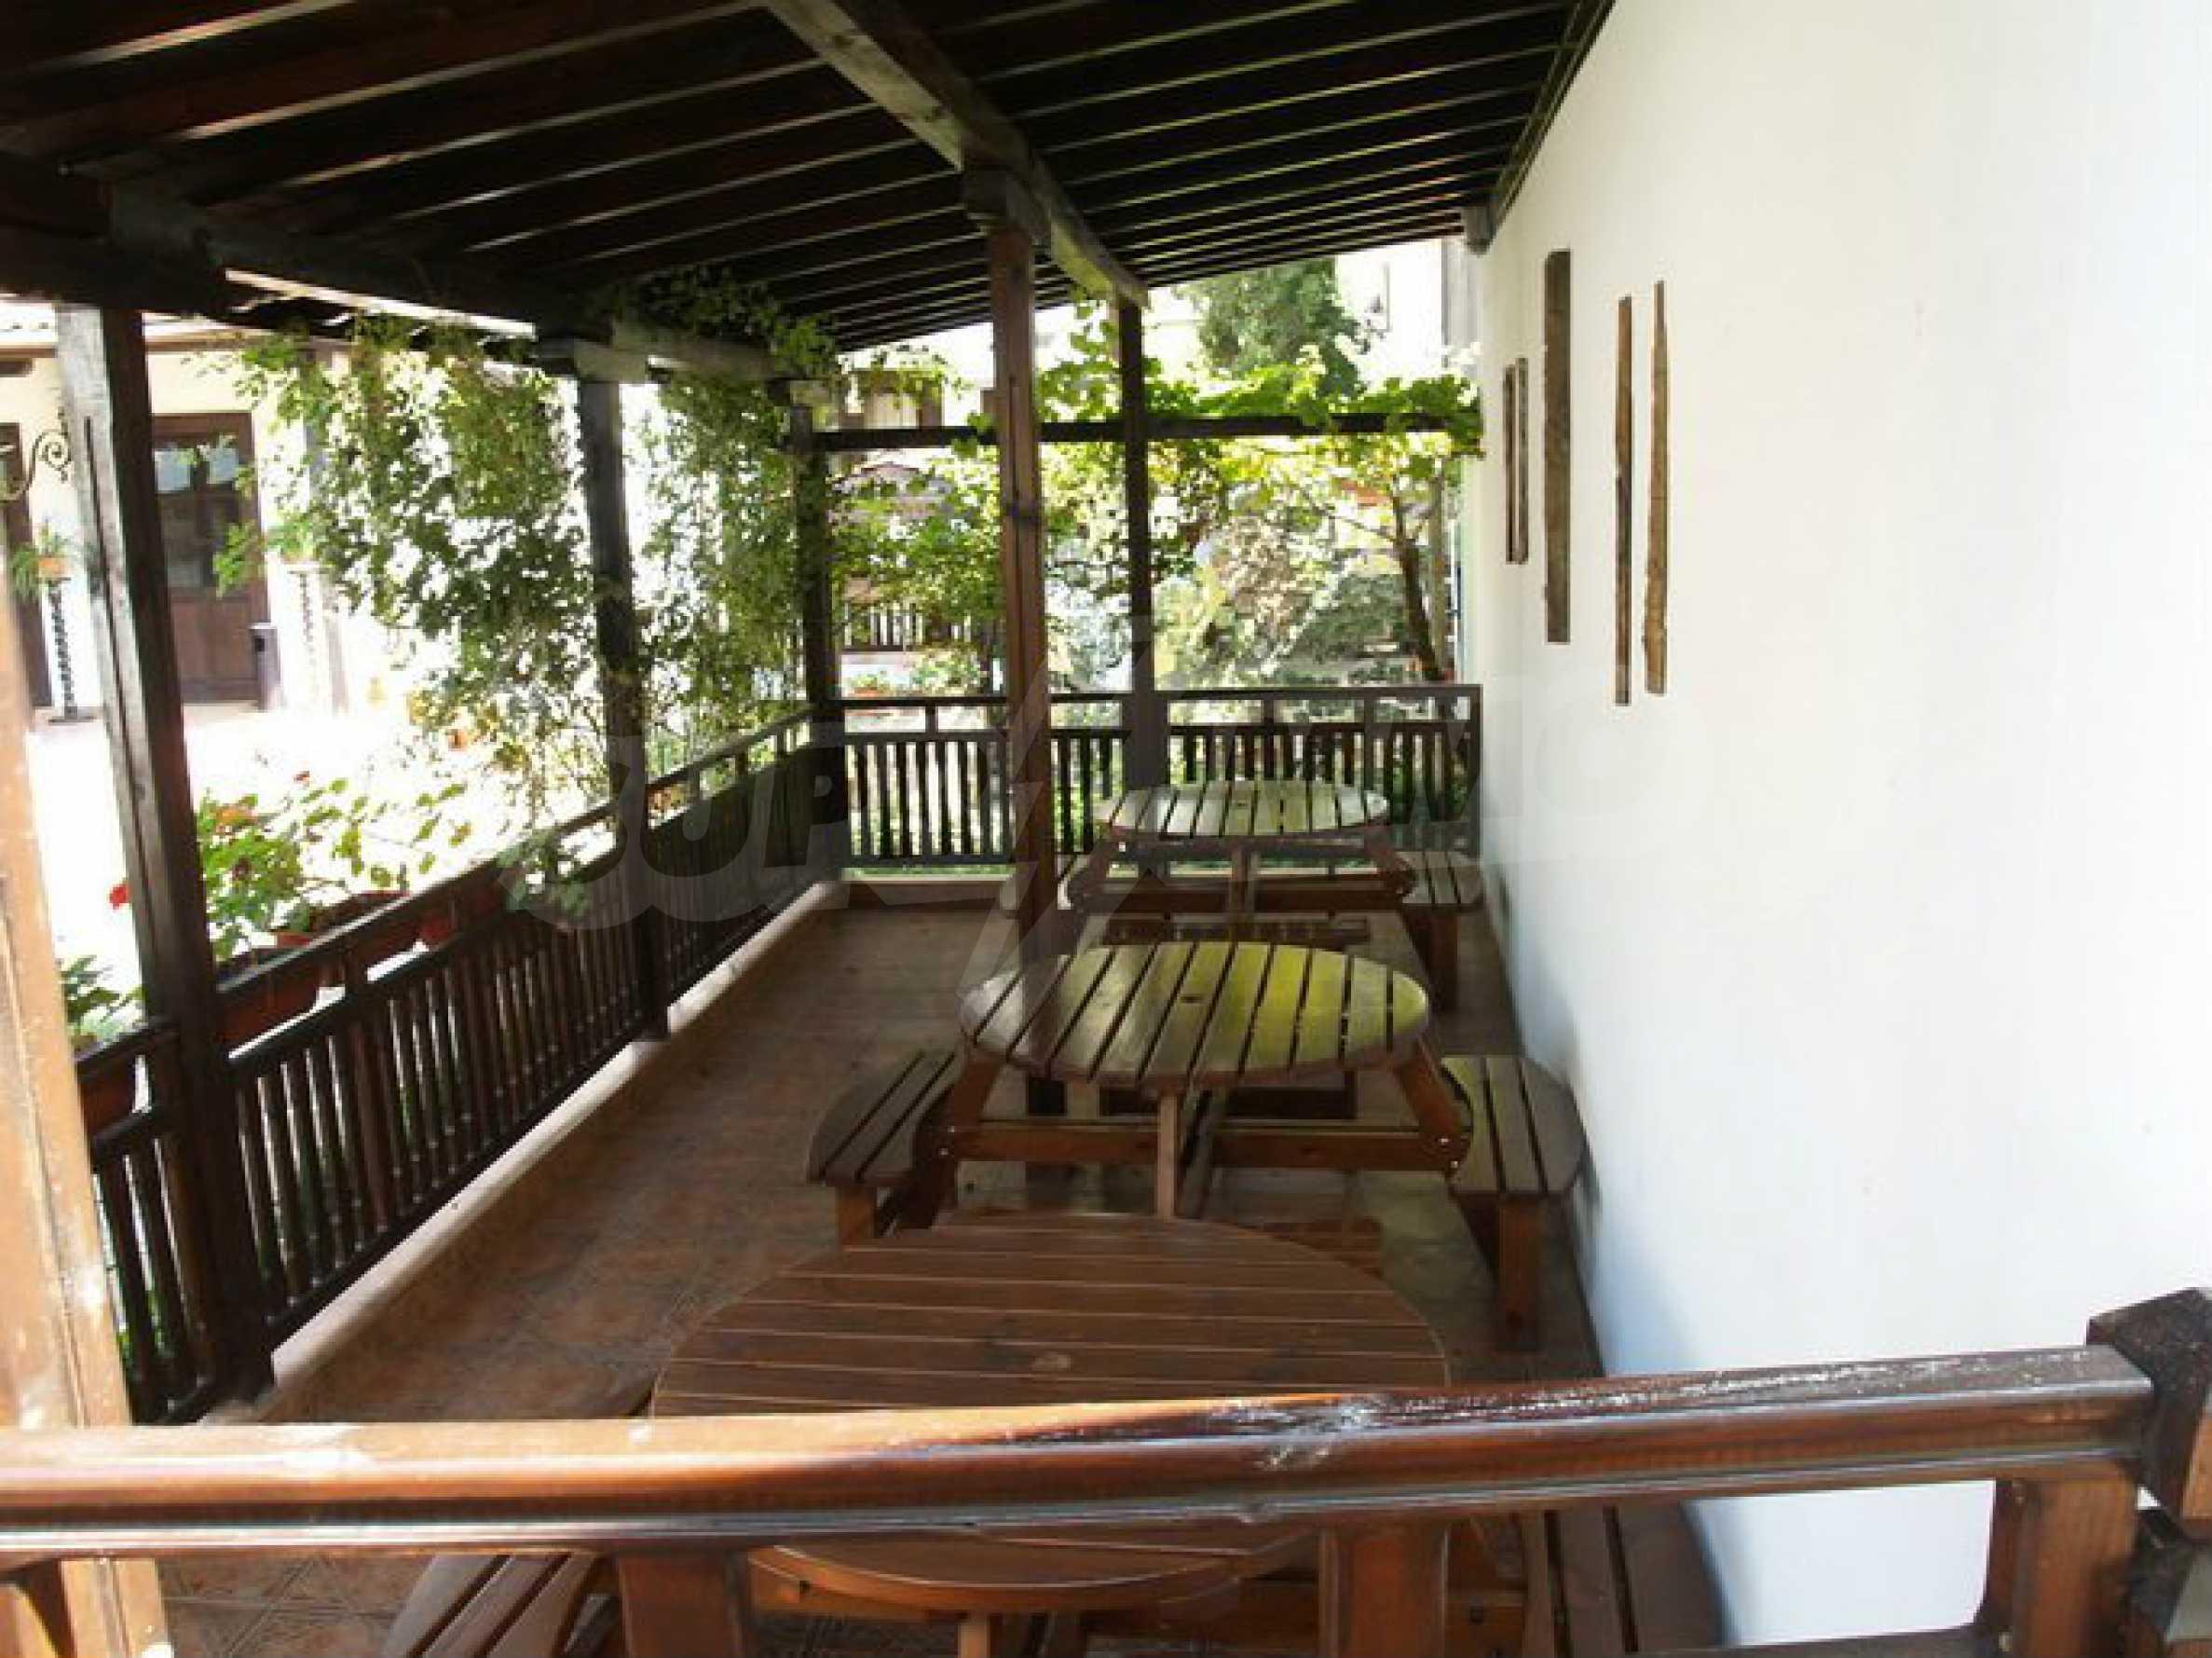 Hotelanlage mit Restaurant am Ufer des Flusses Osam in Lovech 10